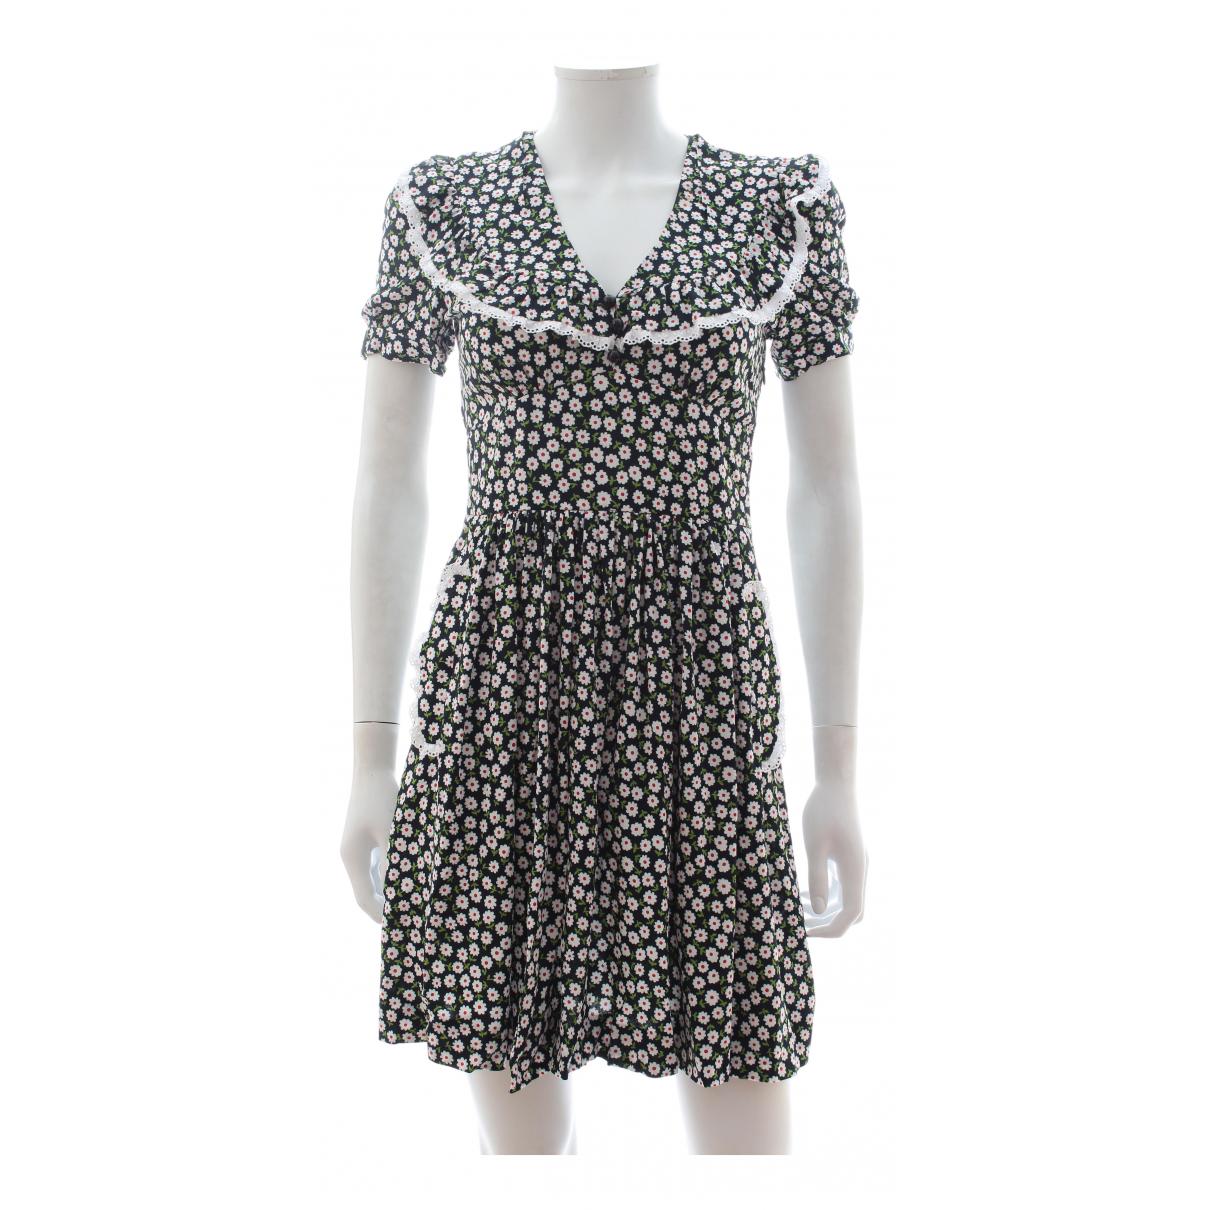 Miu Miu N Multicolour dress for Women 36 IT